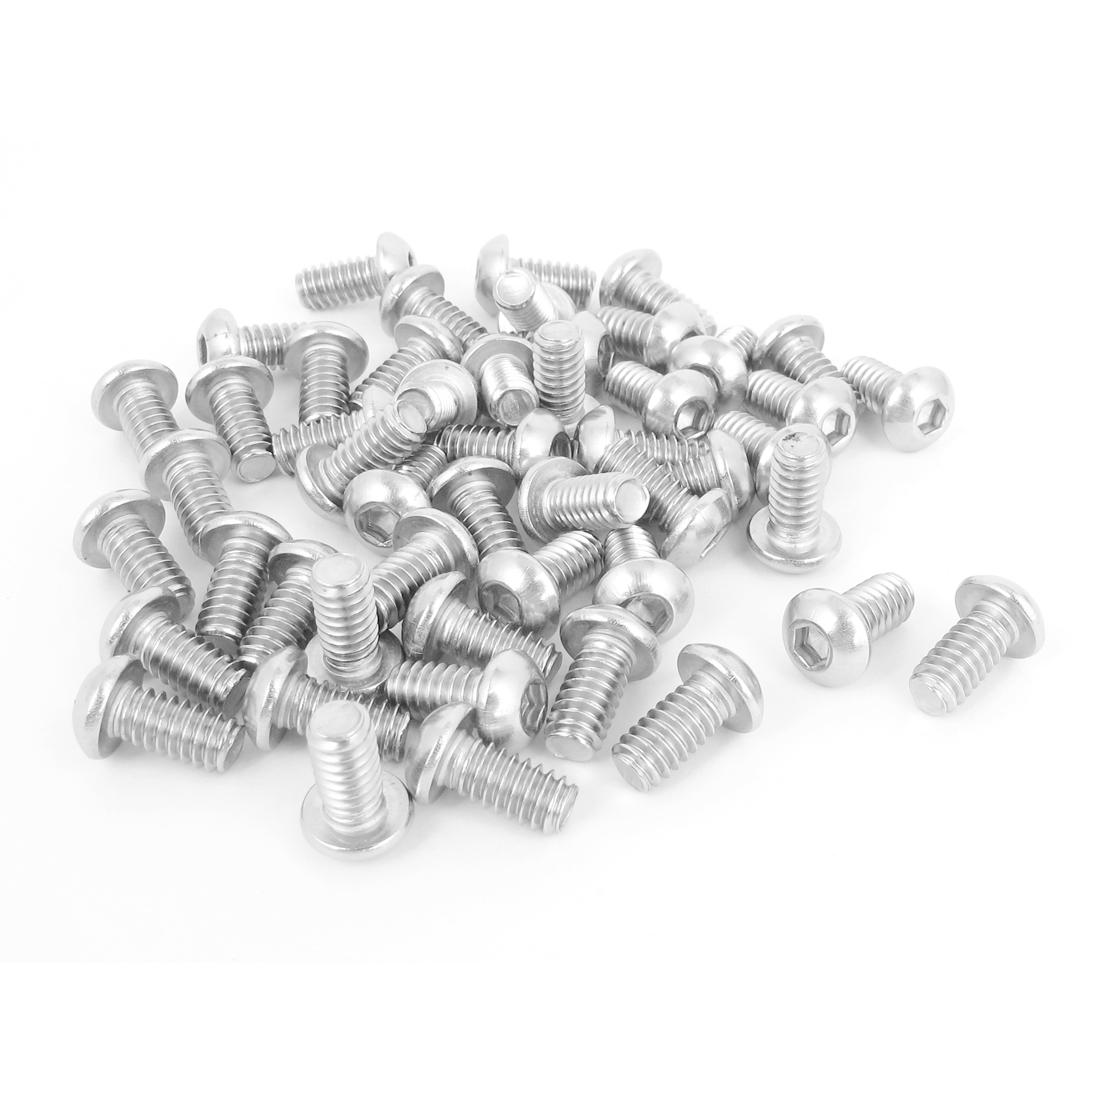 "50pcs 1/4""-20x1/2"" Stainless Steel Hex Socket Button Head Bolts Screws"